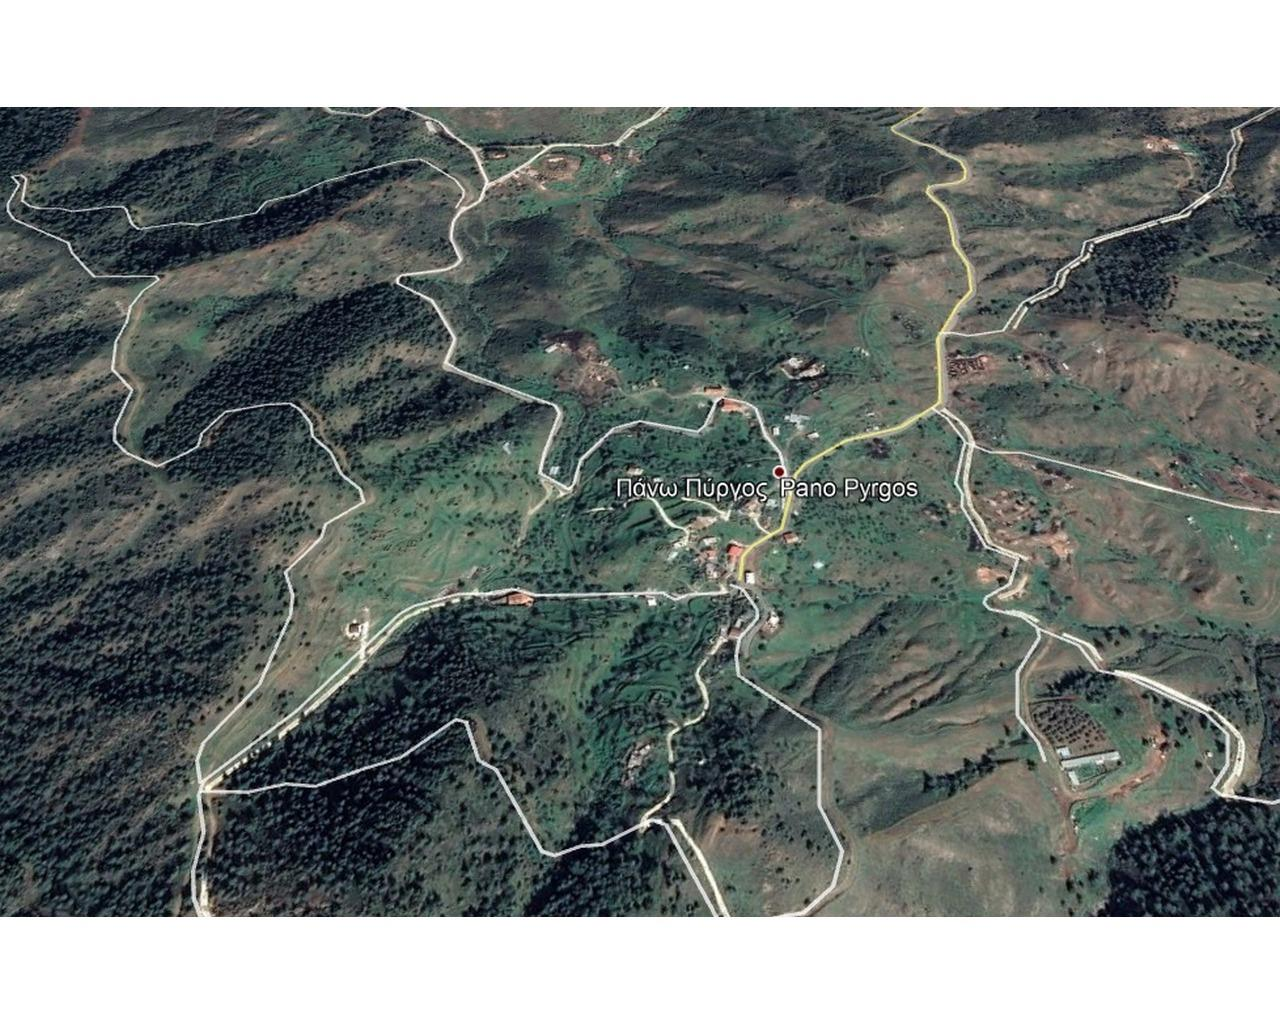 Land Nicosia(Pyrgos Pano)  140 SqMt for sale